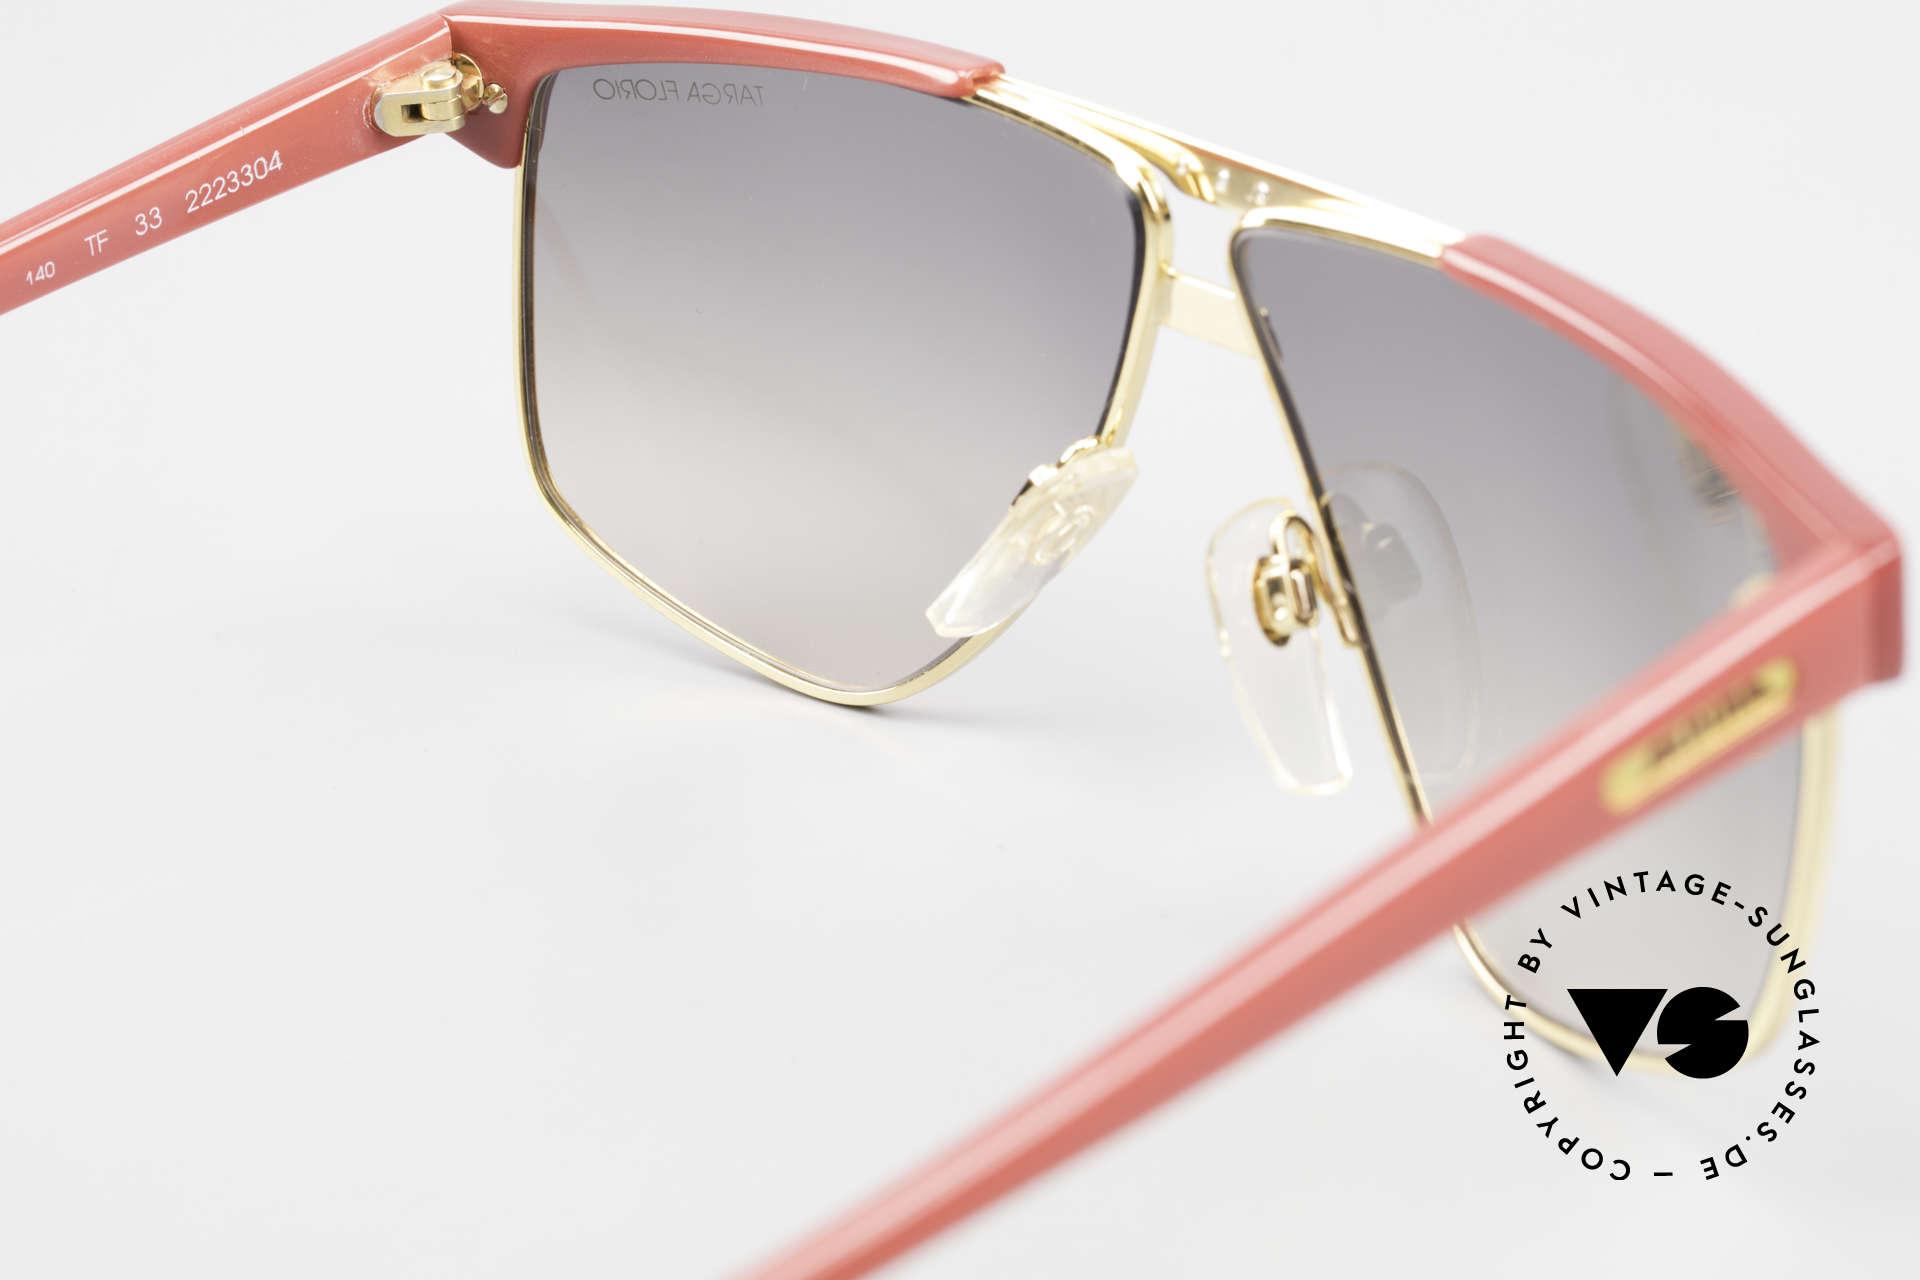 Alpina Targa Florio 33 Rallye Sunglasses Vintage 80's, sun lenses can be replaced with prescription lenses, Made for Men and Women